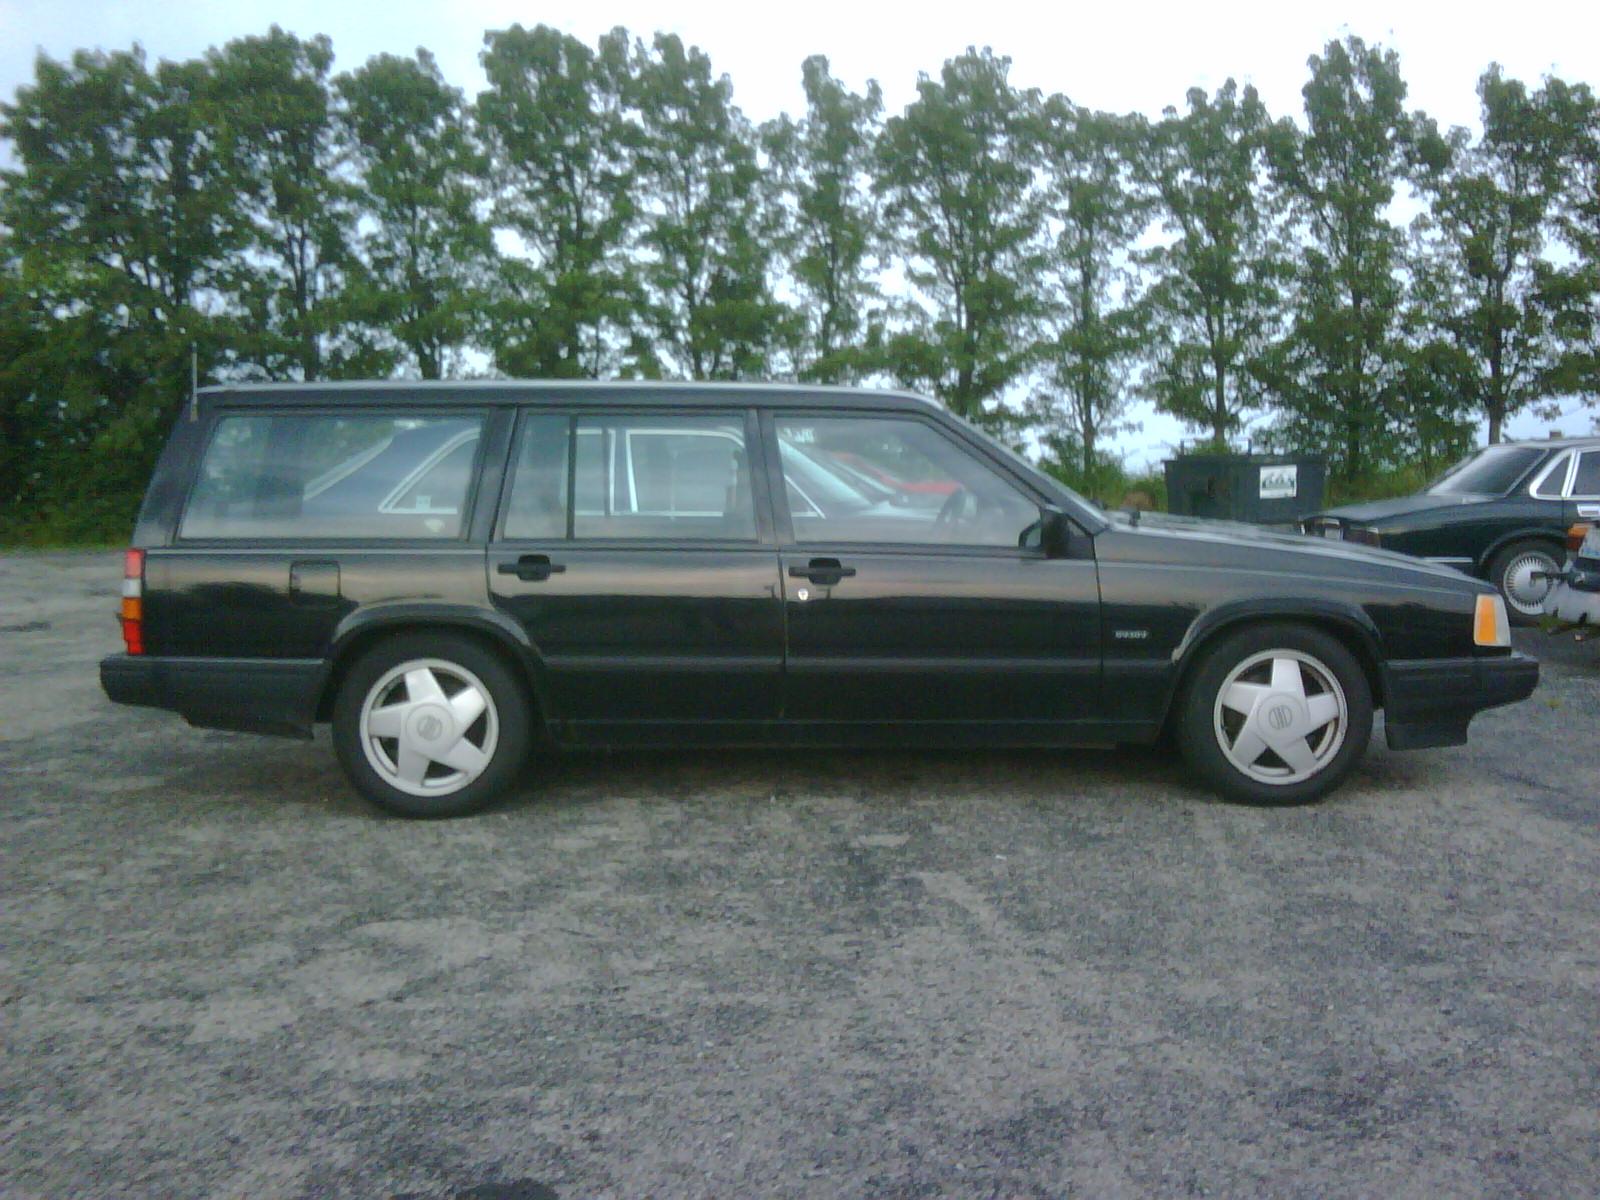 plance1's Volvo 940 turbo wagon: Readers Rides: